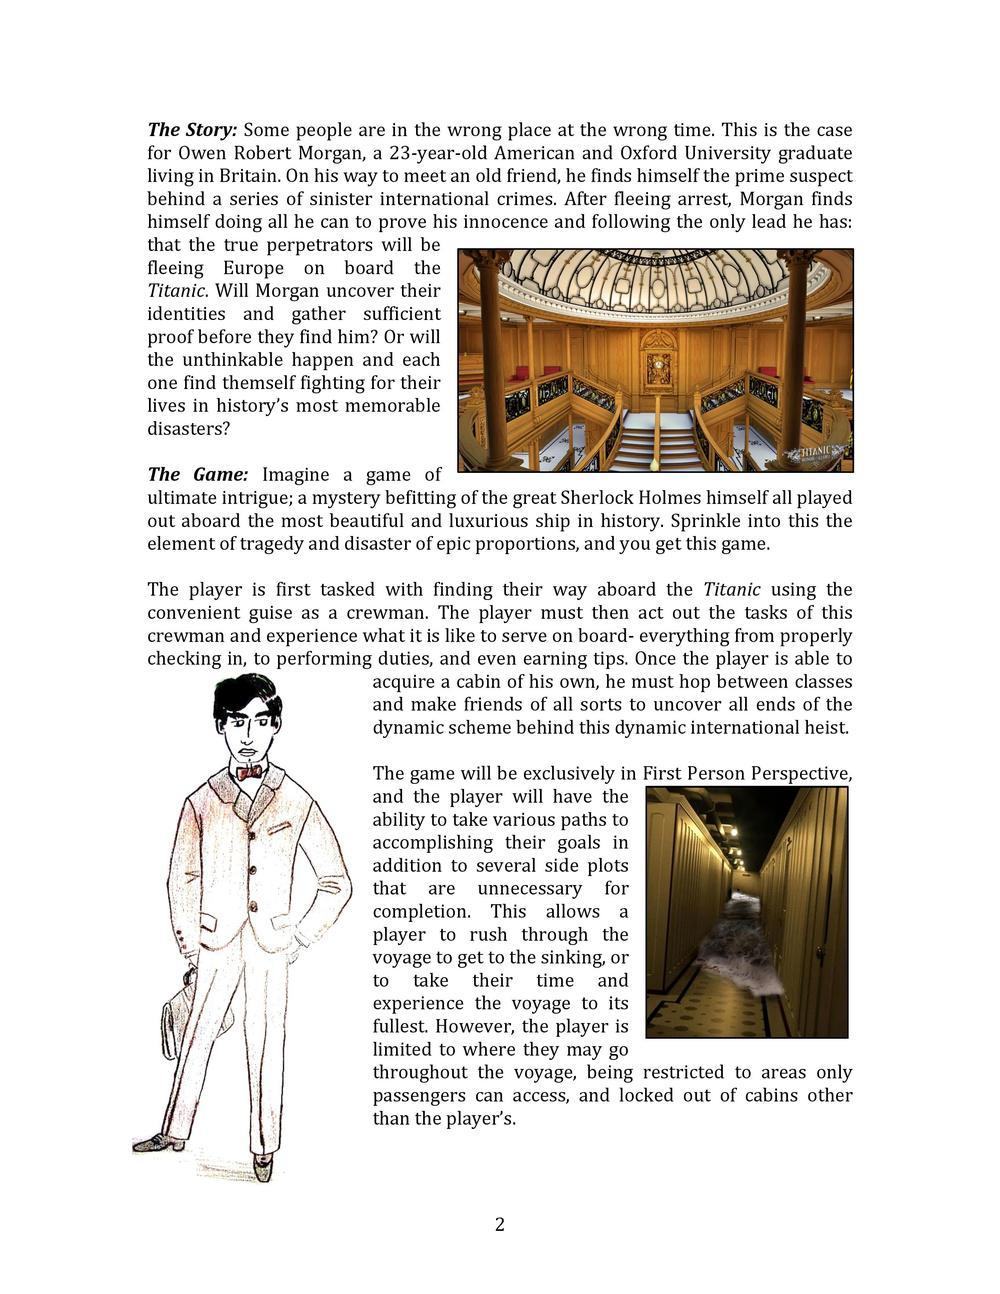 Press Release 1c-page-002.jpg